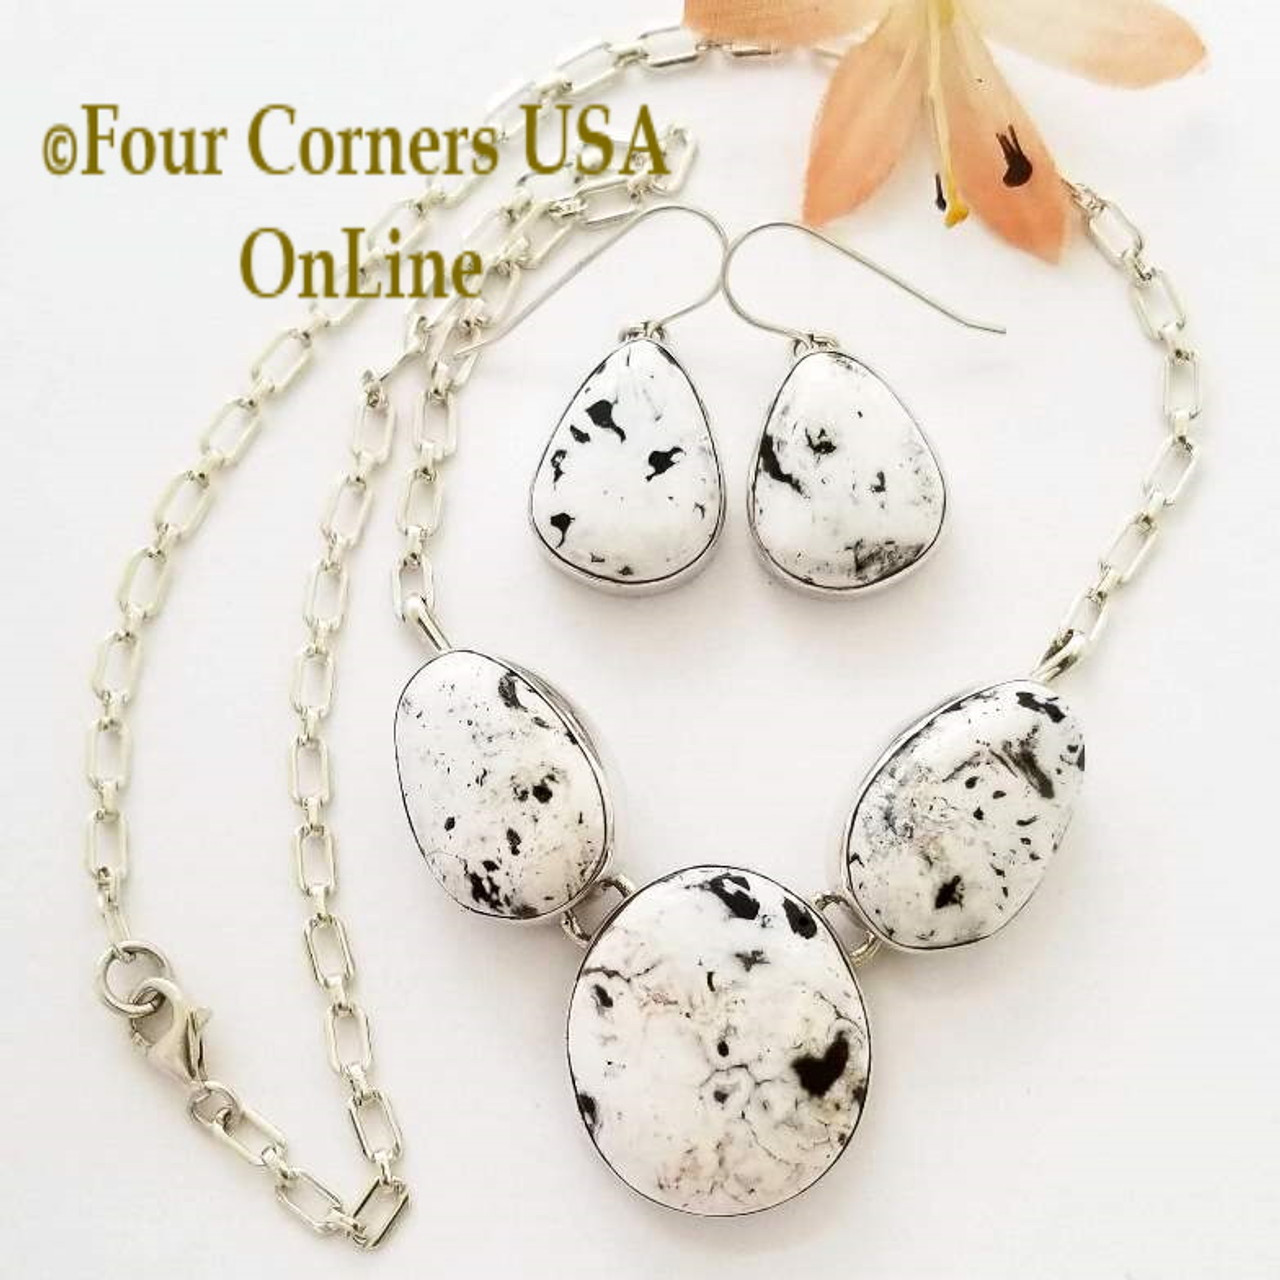 3 Stone White Buffalo Turquoise Necklace Earring Jewelry Set Navajo Lyle  Piaso NAN-1441 Special Buy Final Sale